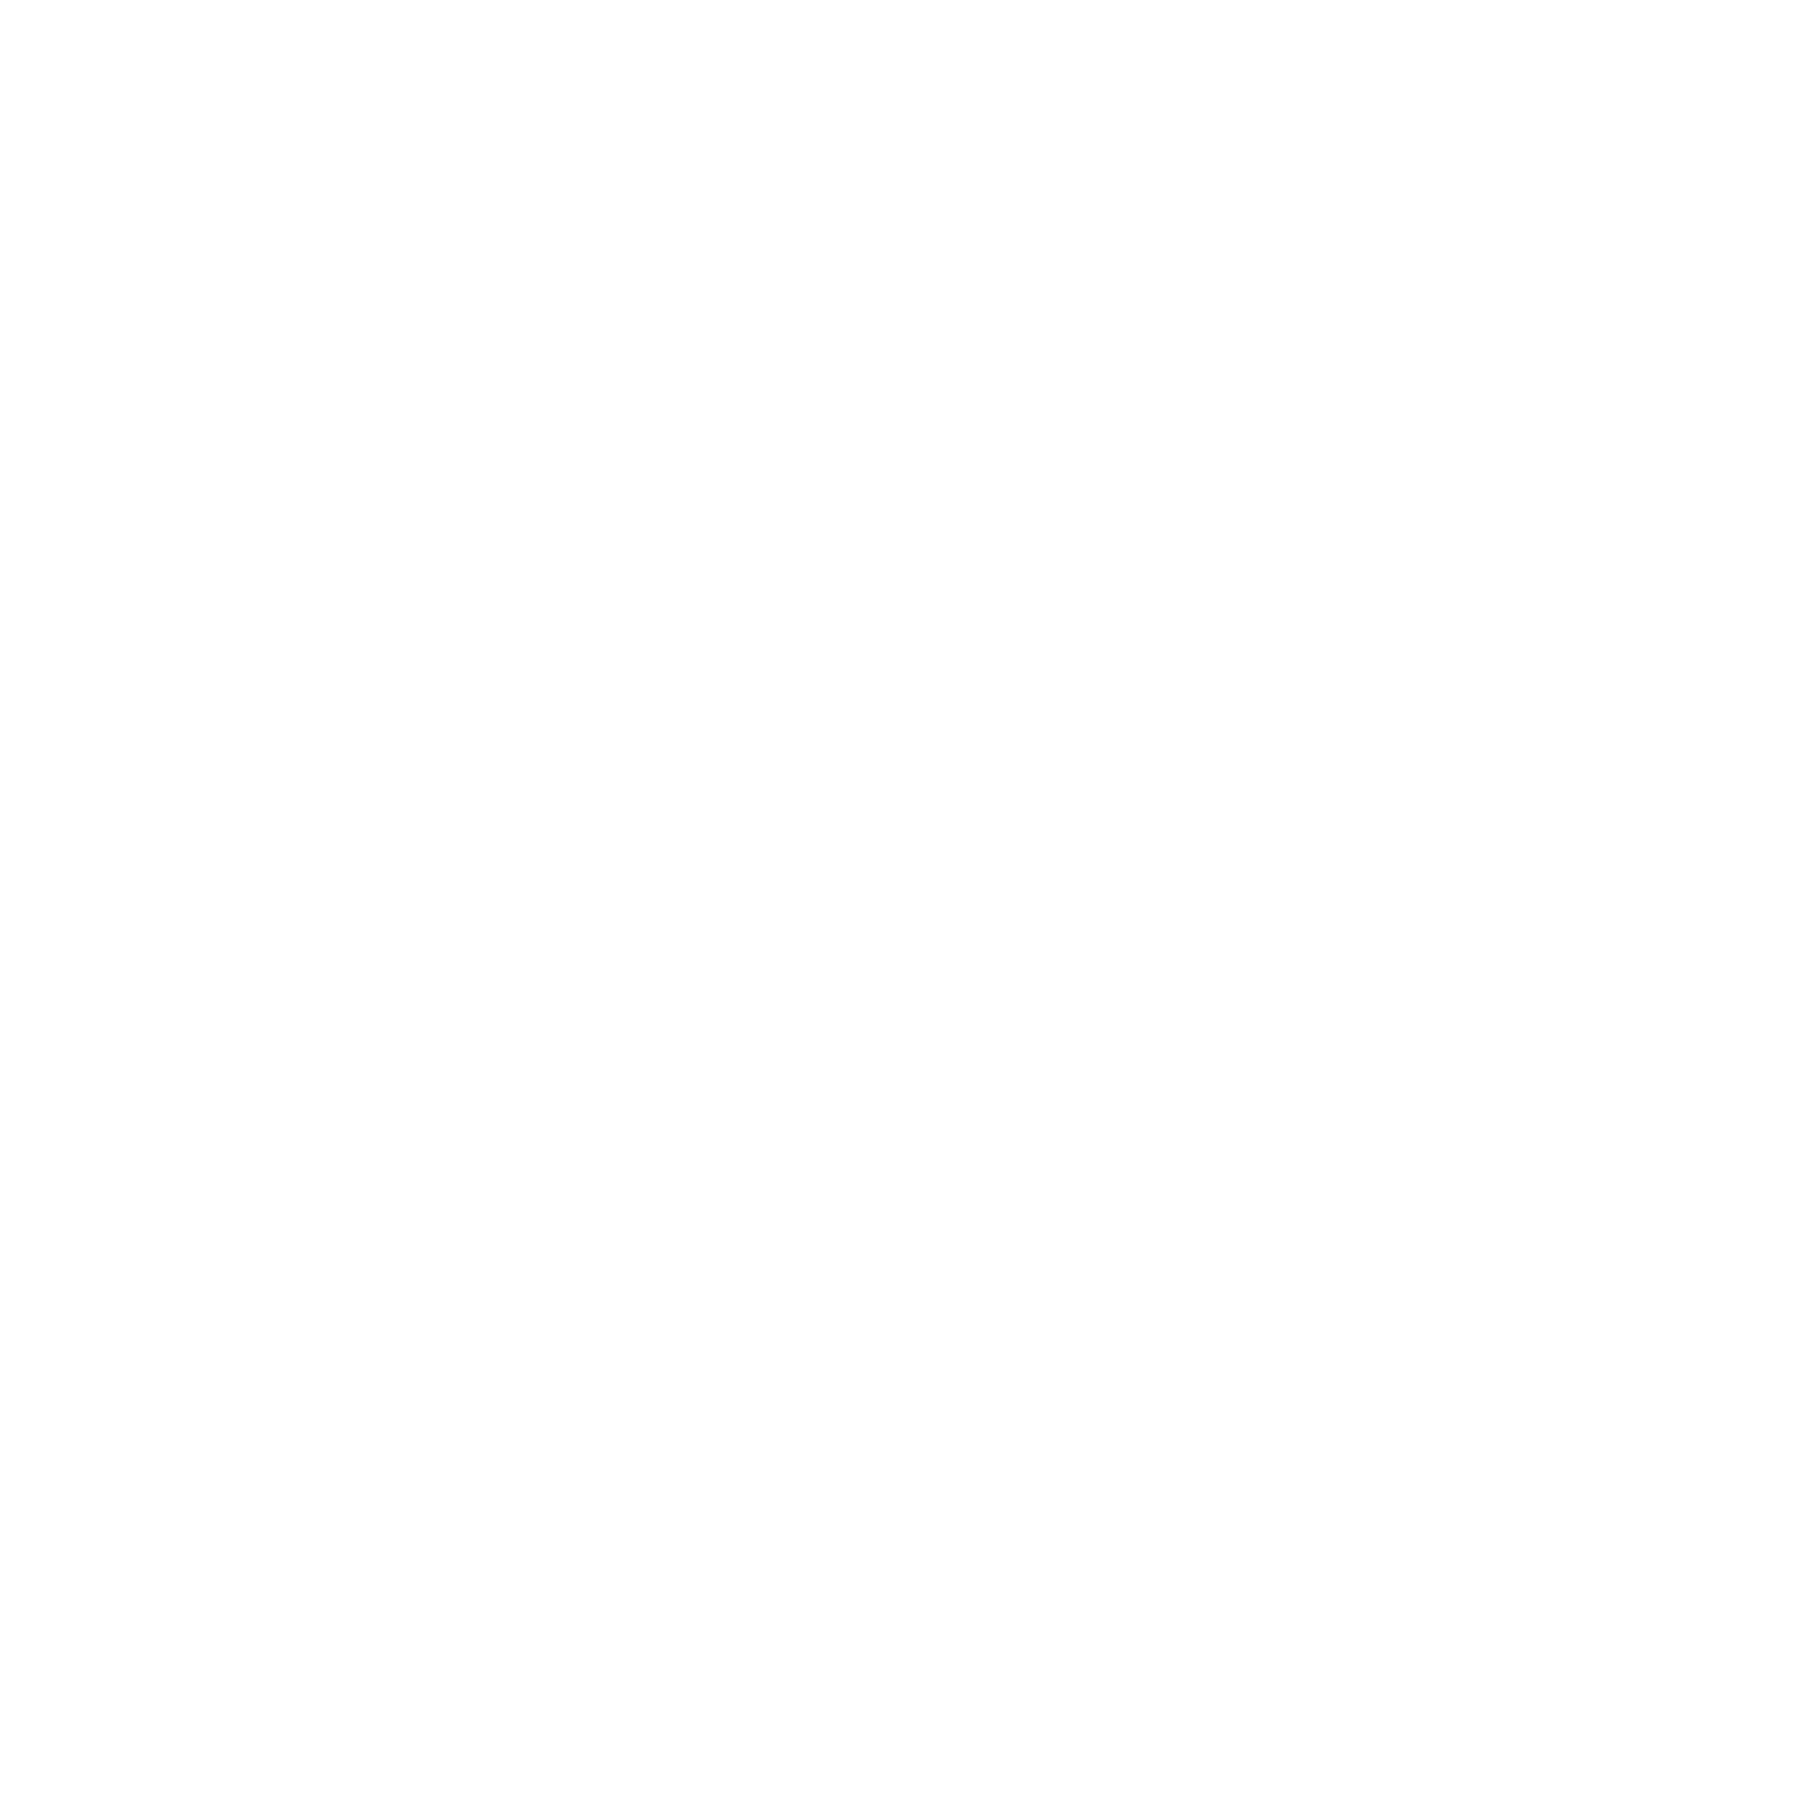 Award - A Prime white